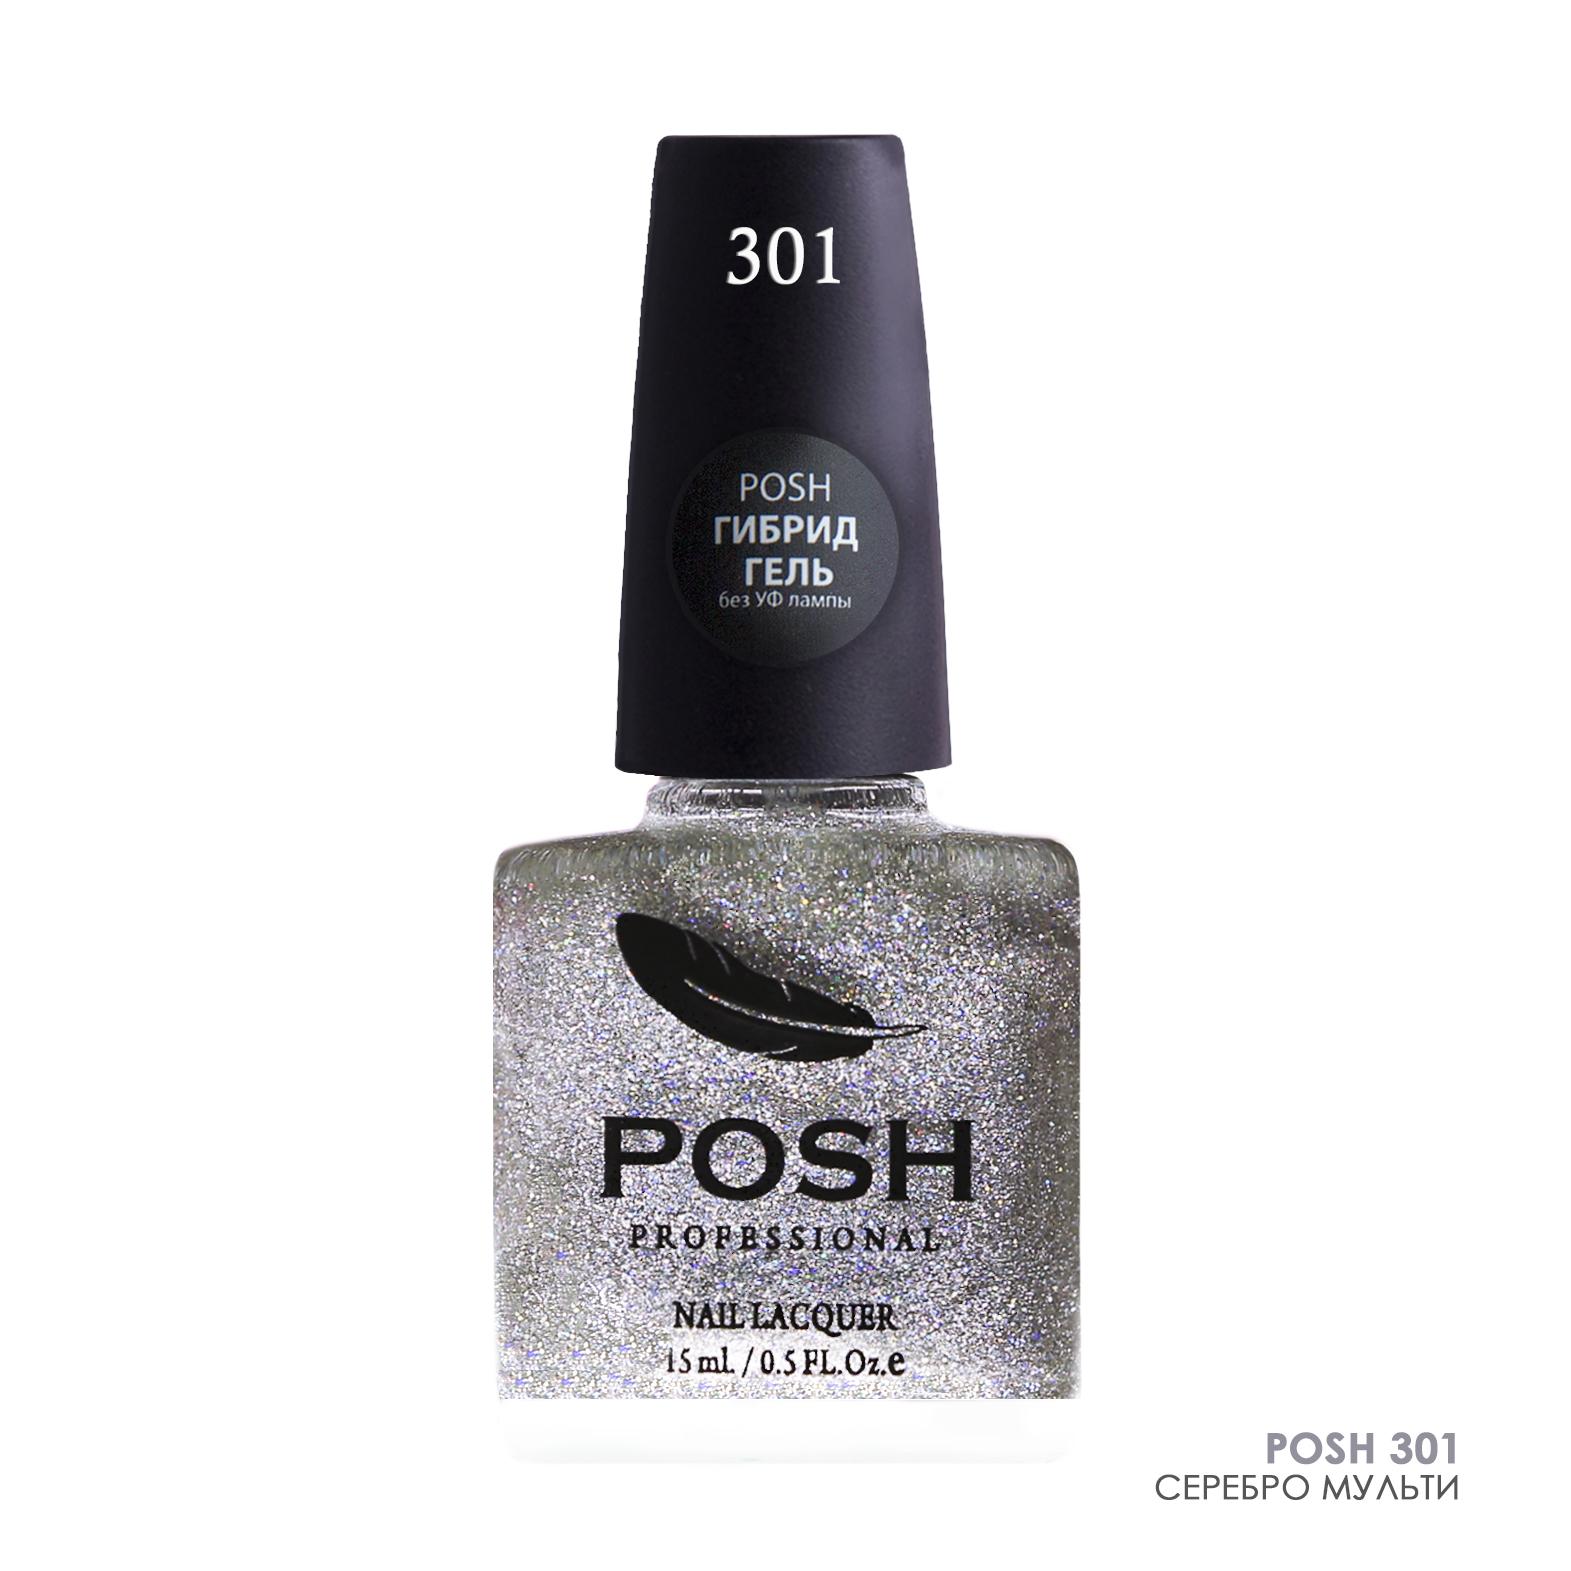 POSH 301 лак для ногтей с блестками Серебро мульти 15мл